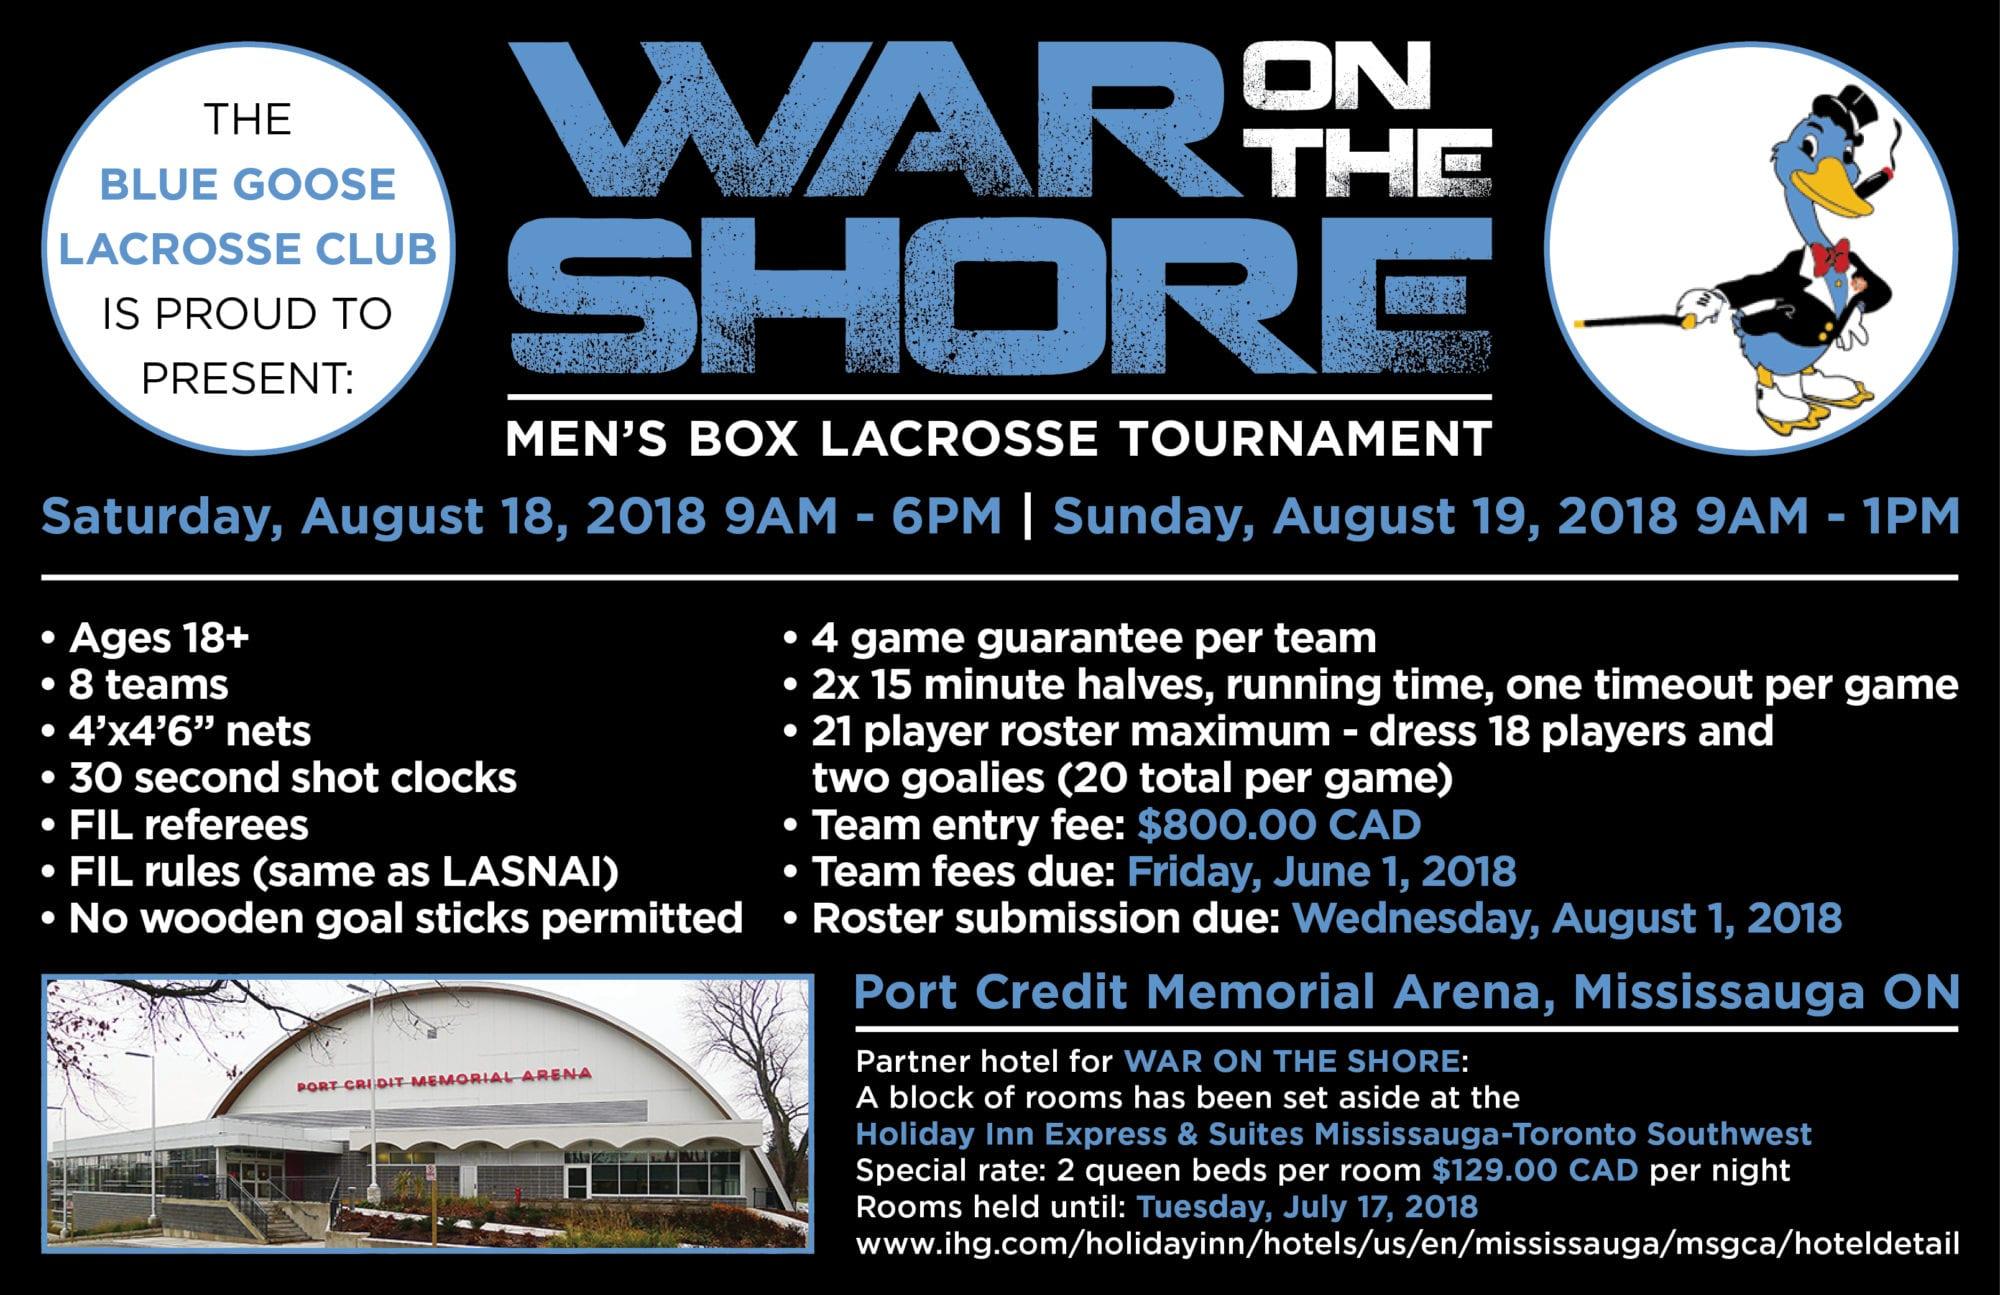 War_on_the_Shore update